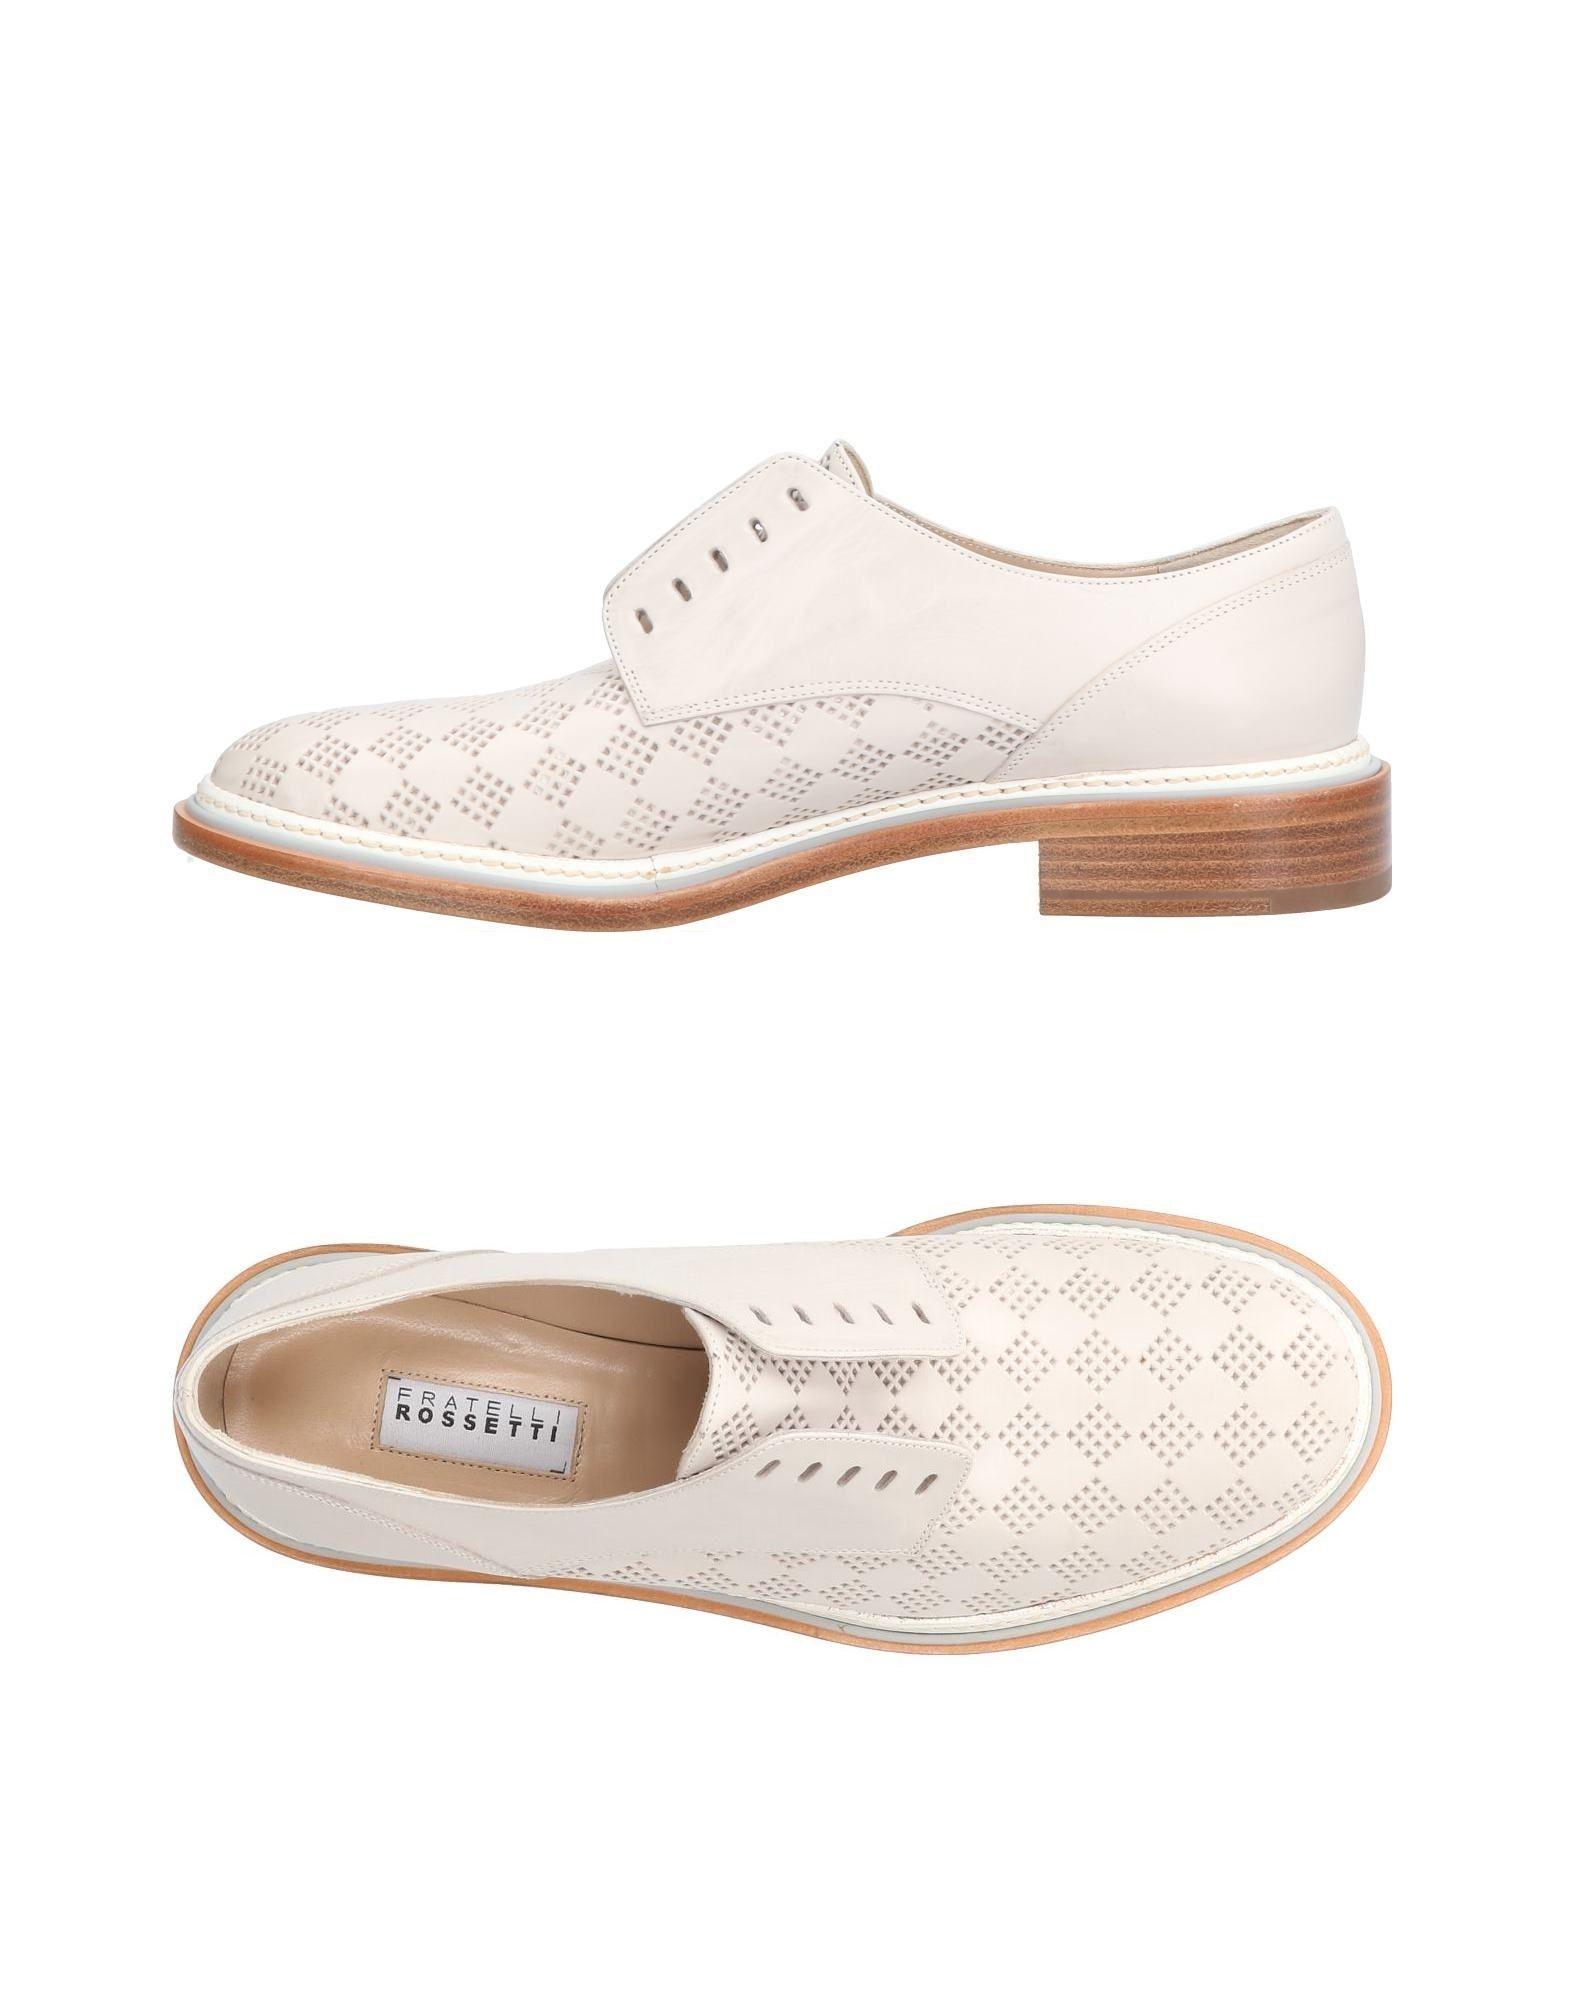 Fratelli Rossetti aussehende Schnürschuhe Damen  11440663QHGut aussehende Rossetti strapazierfähige Schuhe 6c82f9